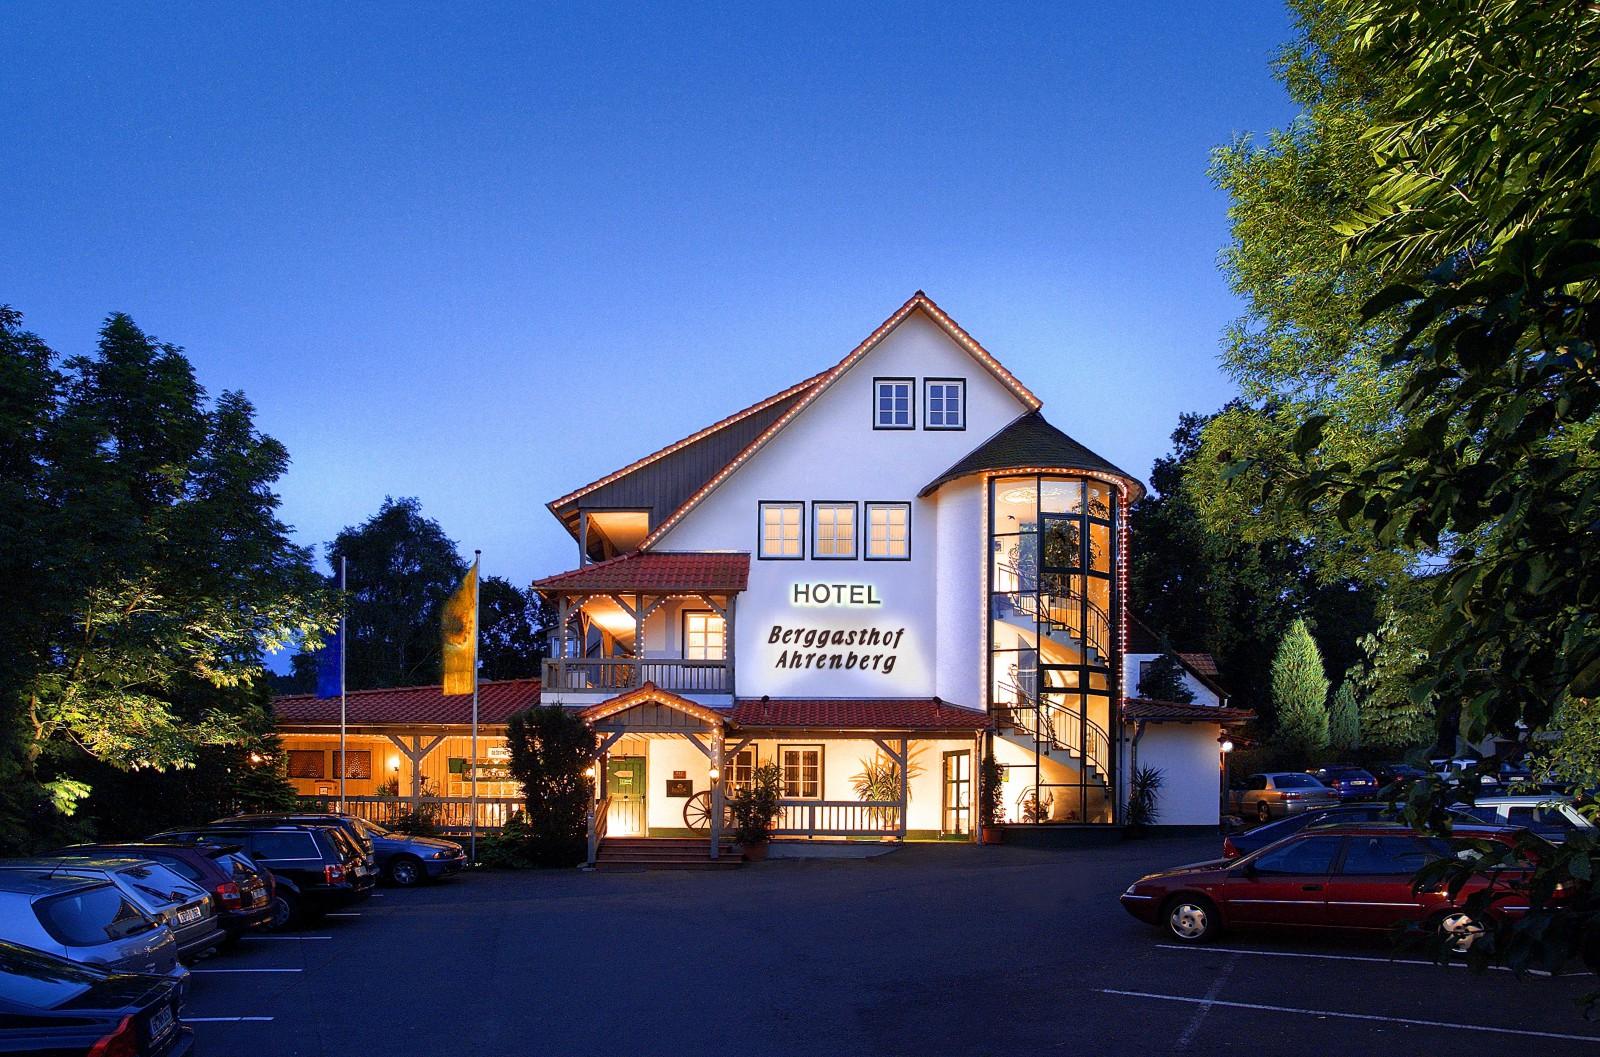 Hotel Ahrenberg Bad Sooden Allendorf